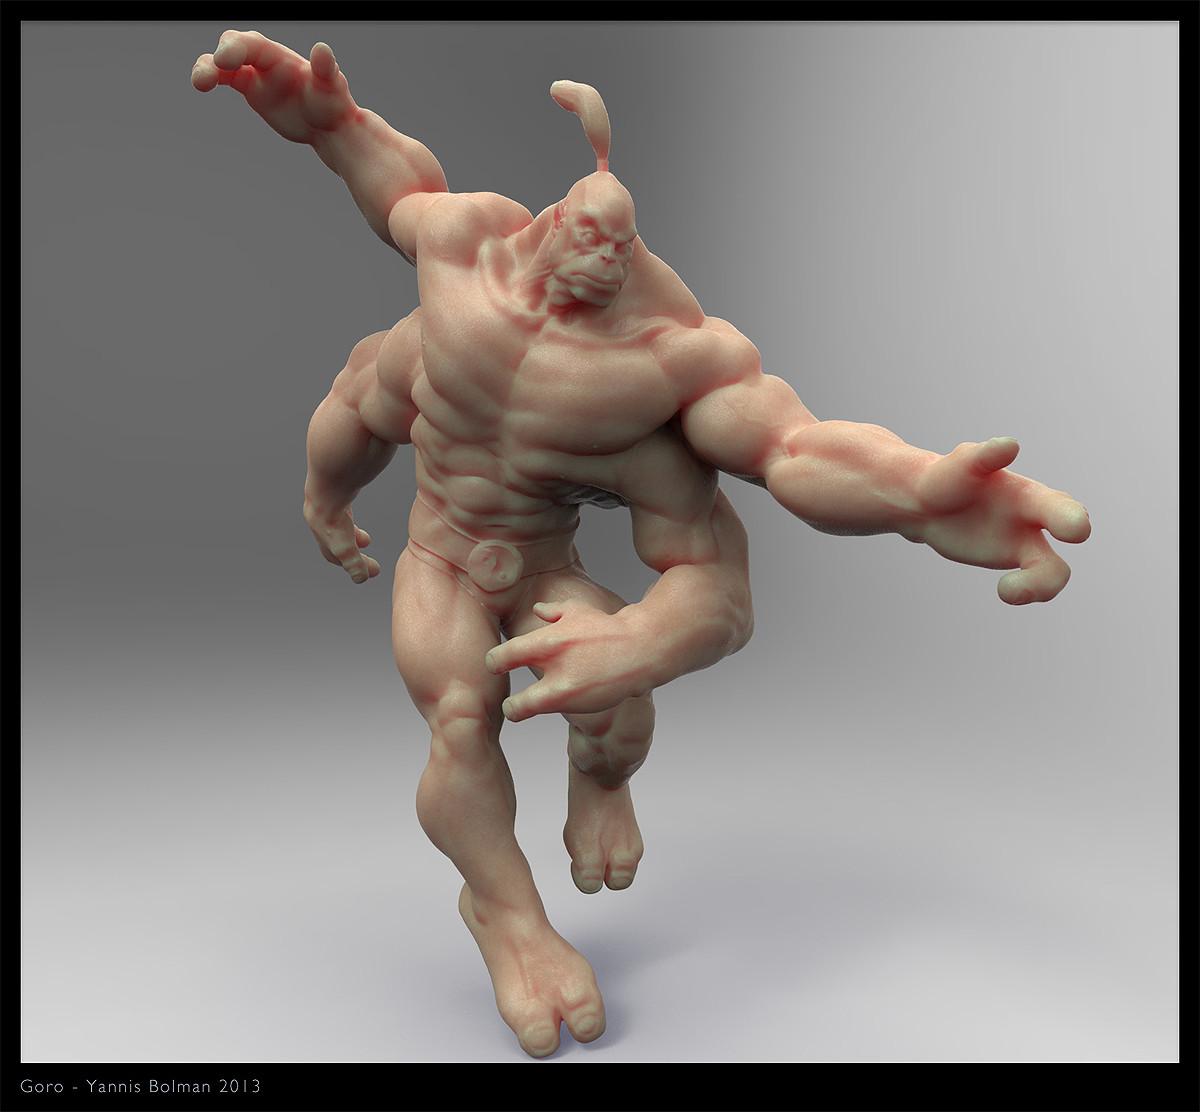 Yannis Bolman - Goro - Mortal Kombat